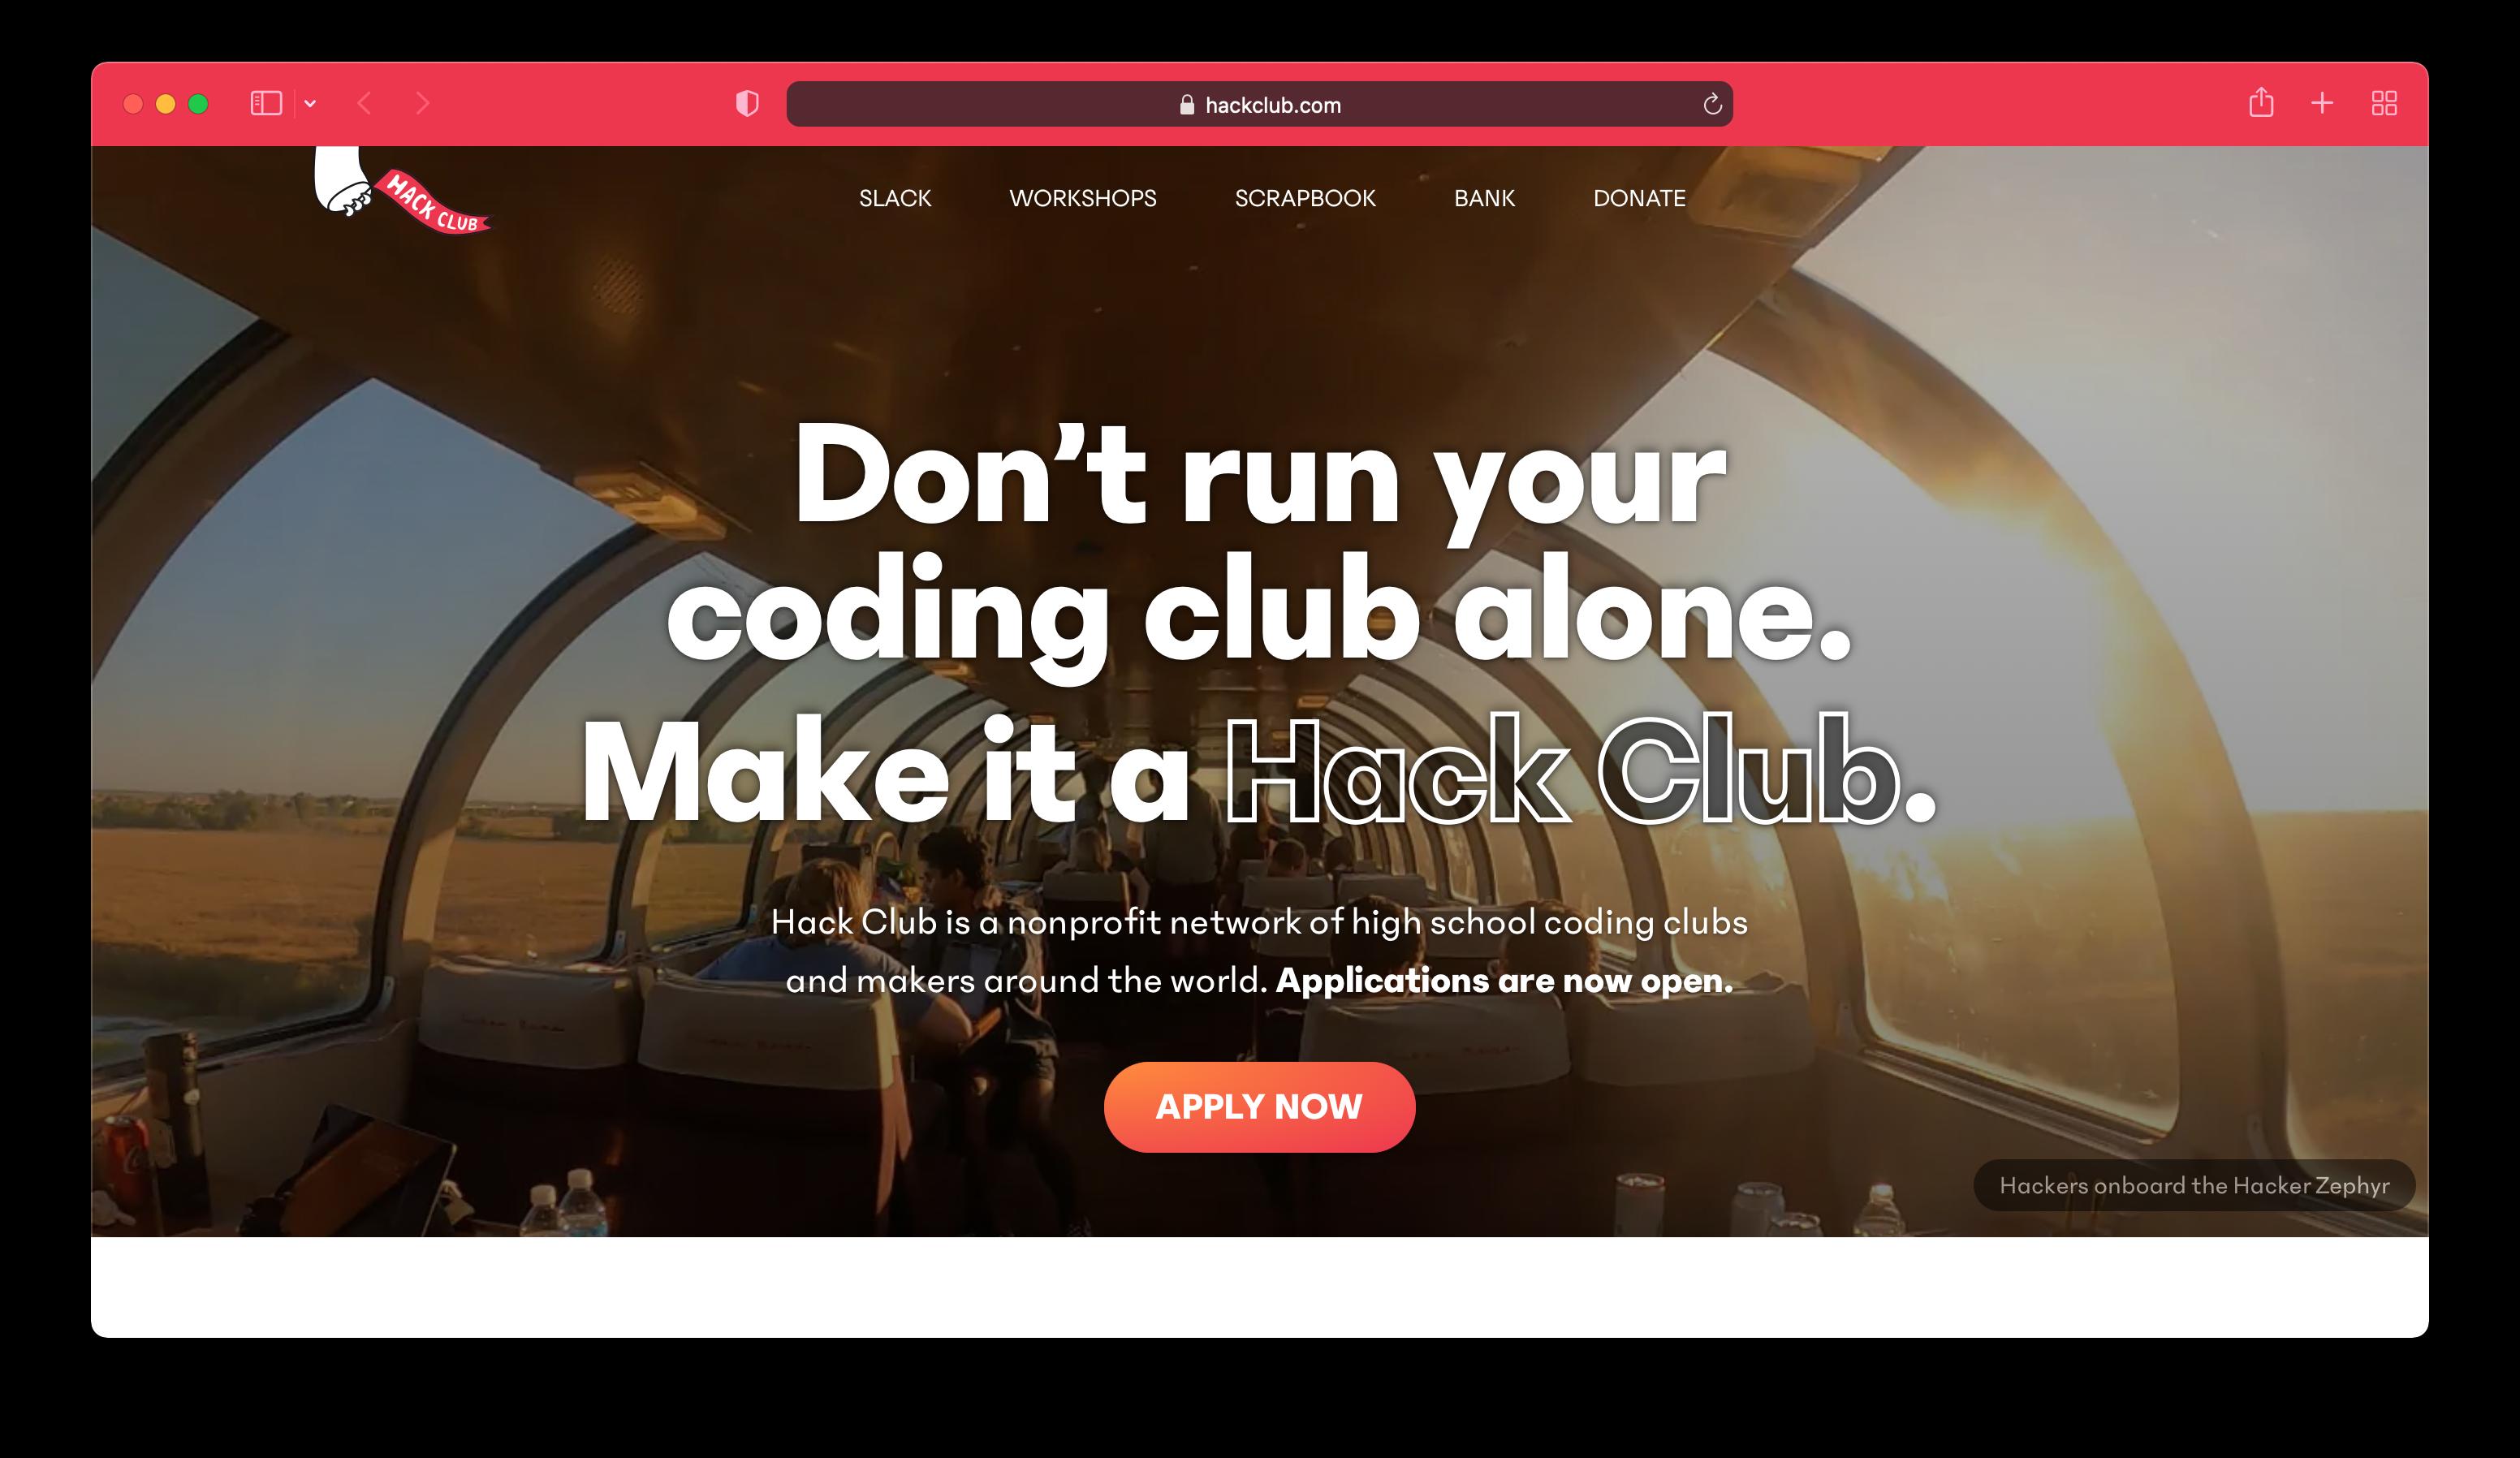 https://cloud-ejjxup7r7-hack-club-bot.vercel.app/0screenshot_2021-08-17_at_12.51.23_am.png